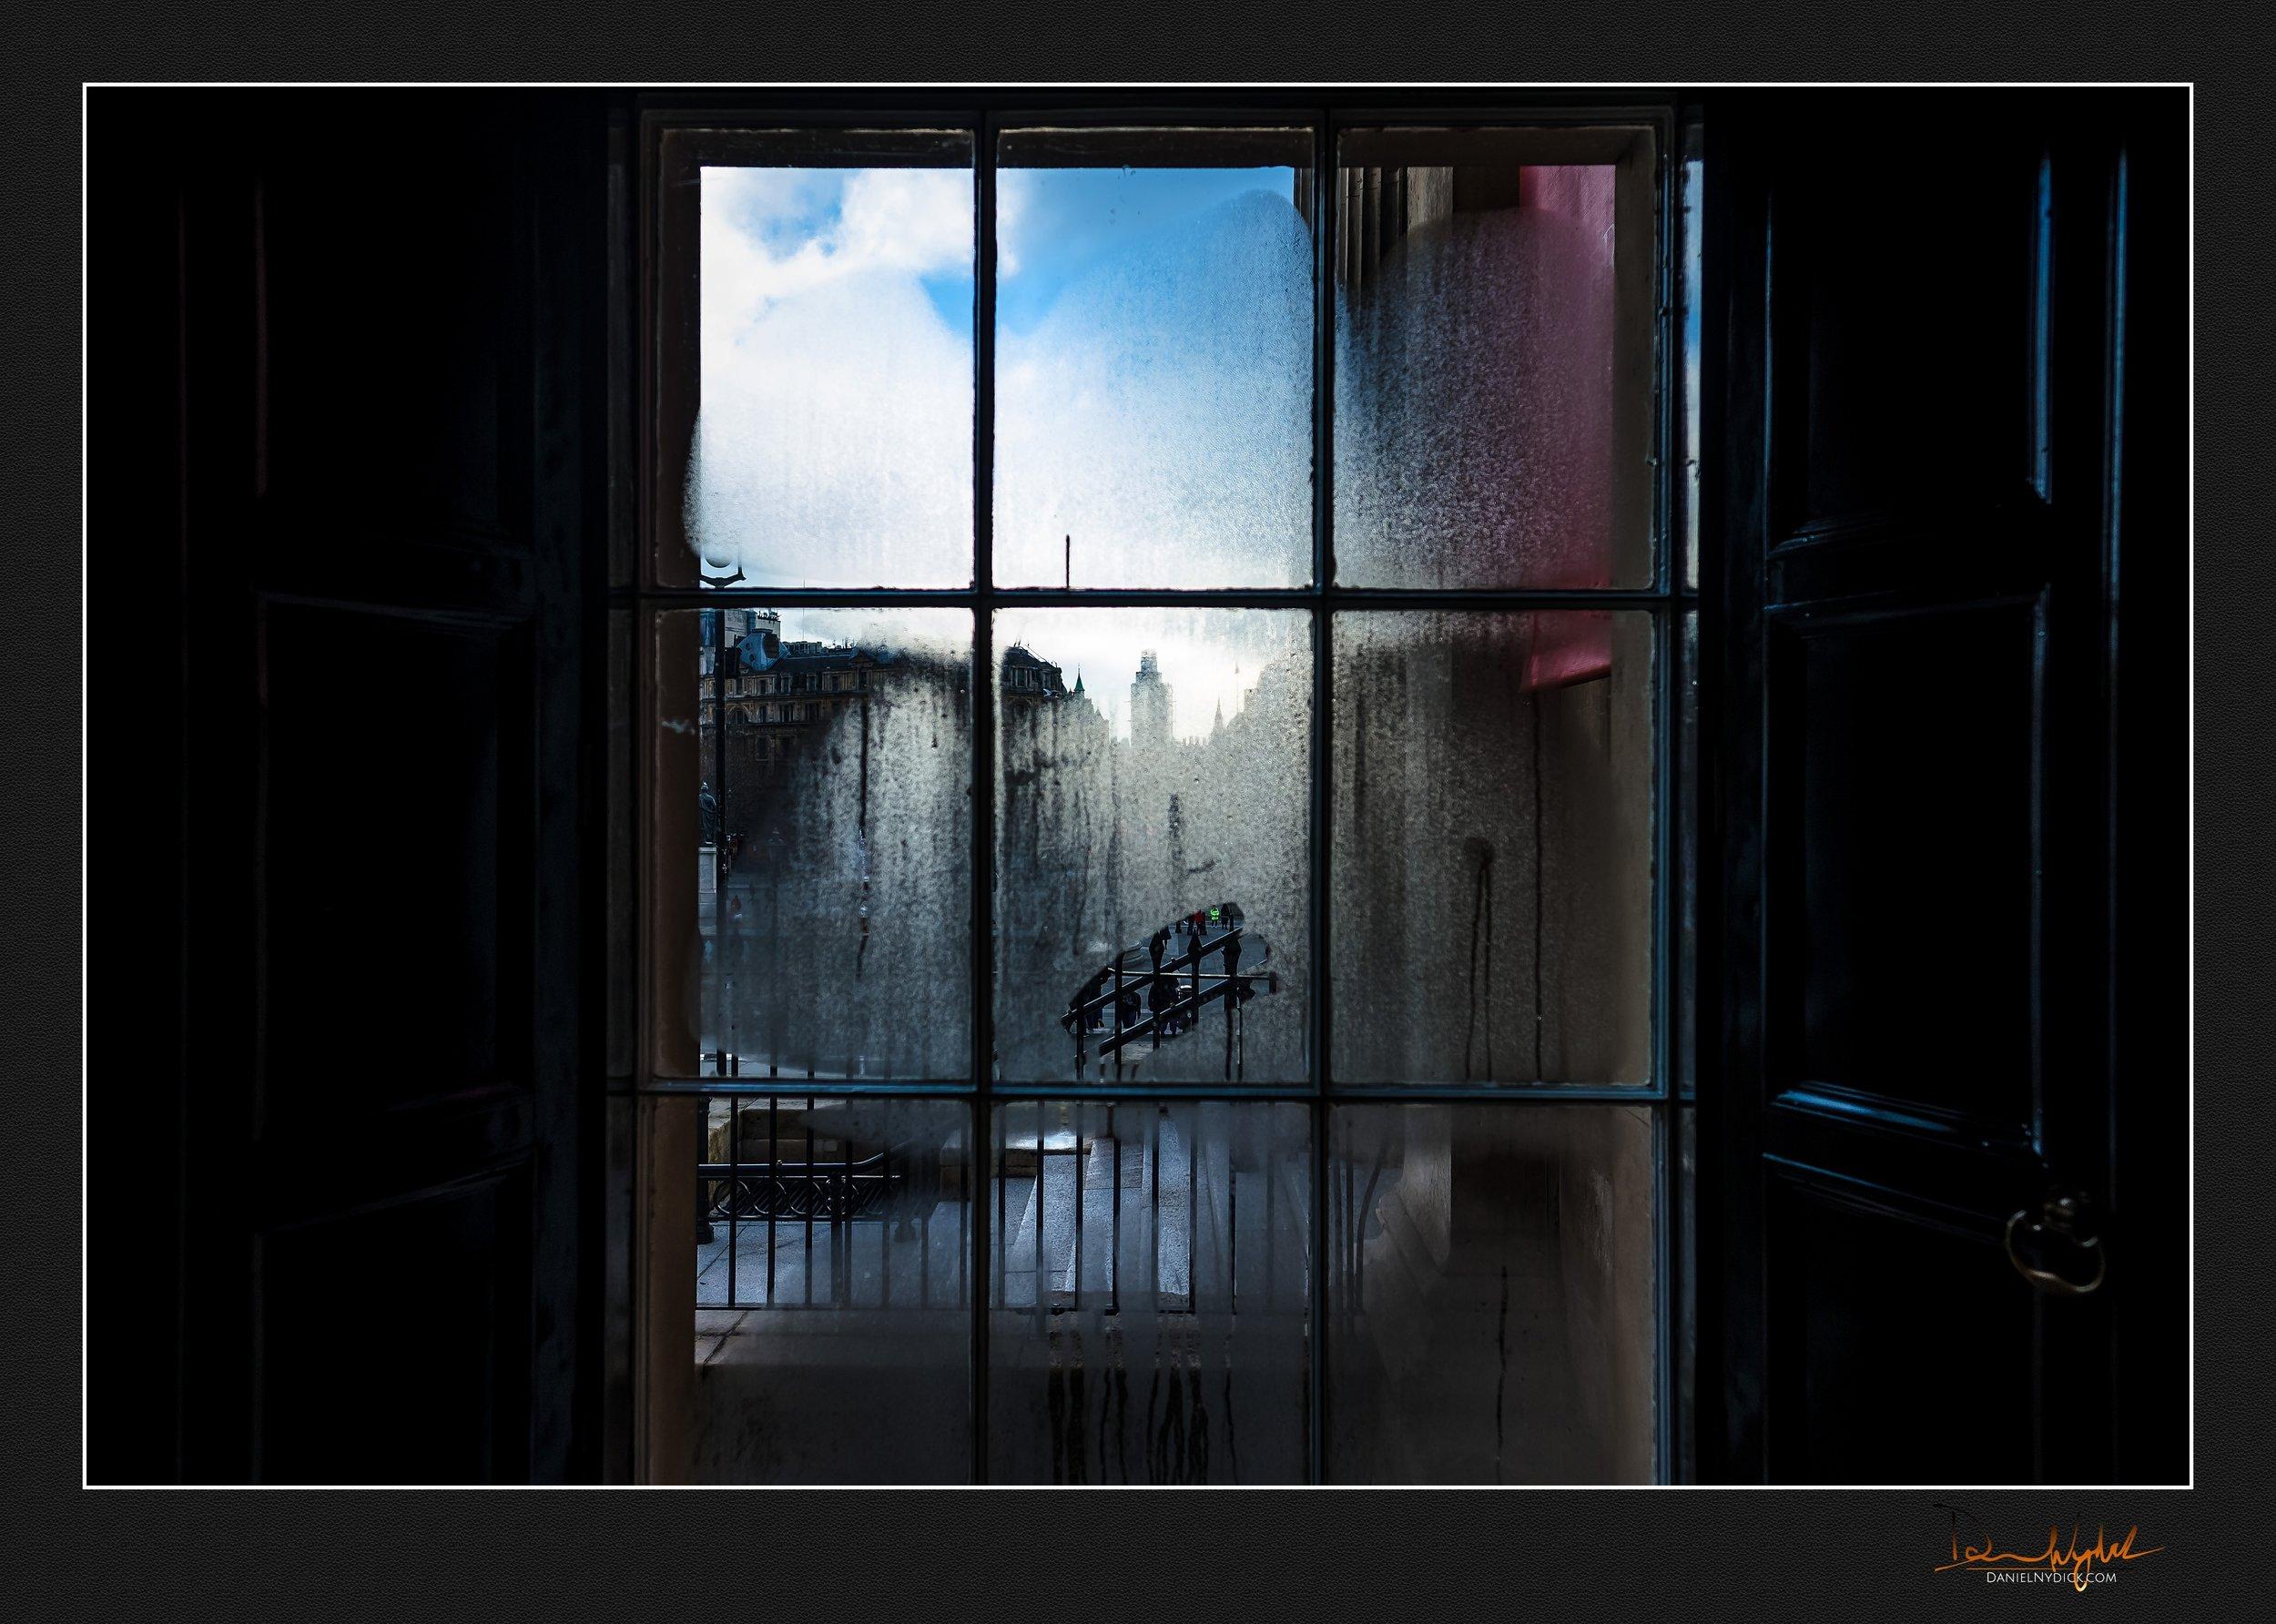 window, fog, national portrait gallery, smudge